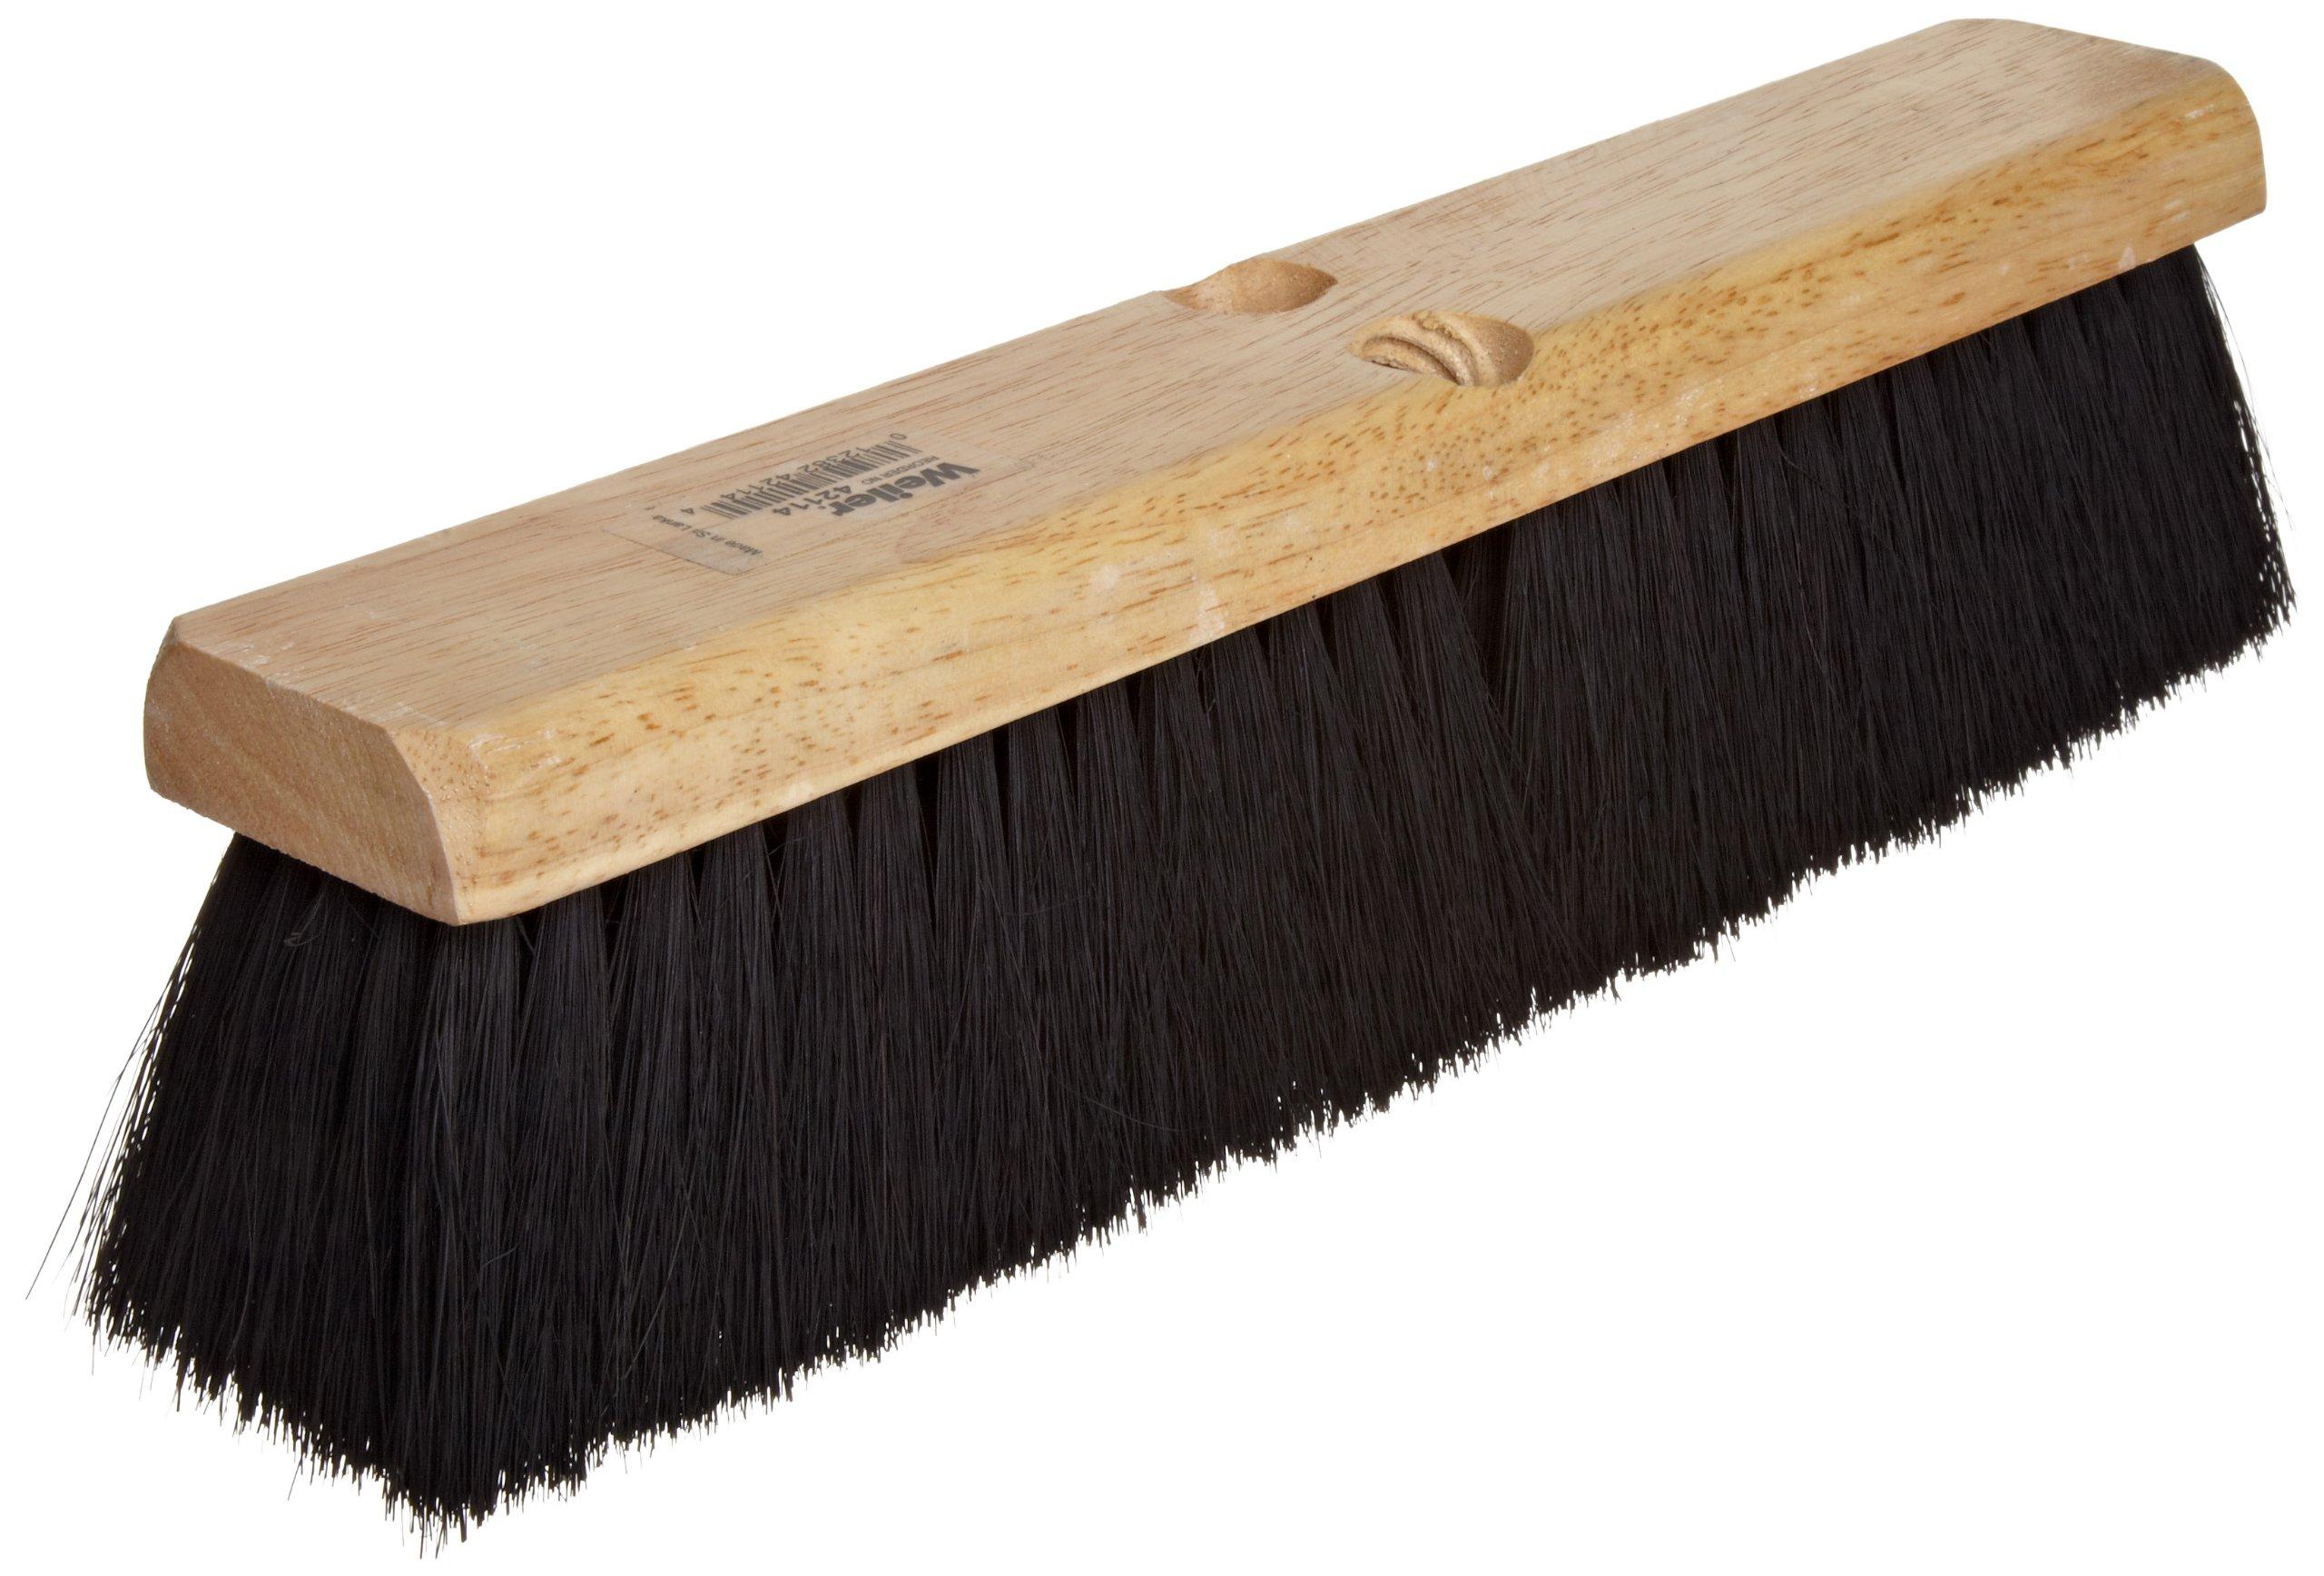 Weiler 25231 Tampico Fiber Medium Sweep Floor Brush with Wood Handle, 2-1/2'' Handle Width, 18'' Overall Length, Natural